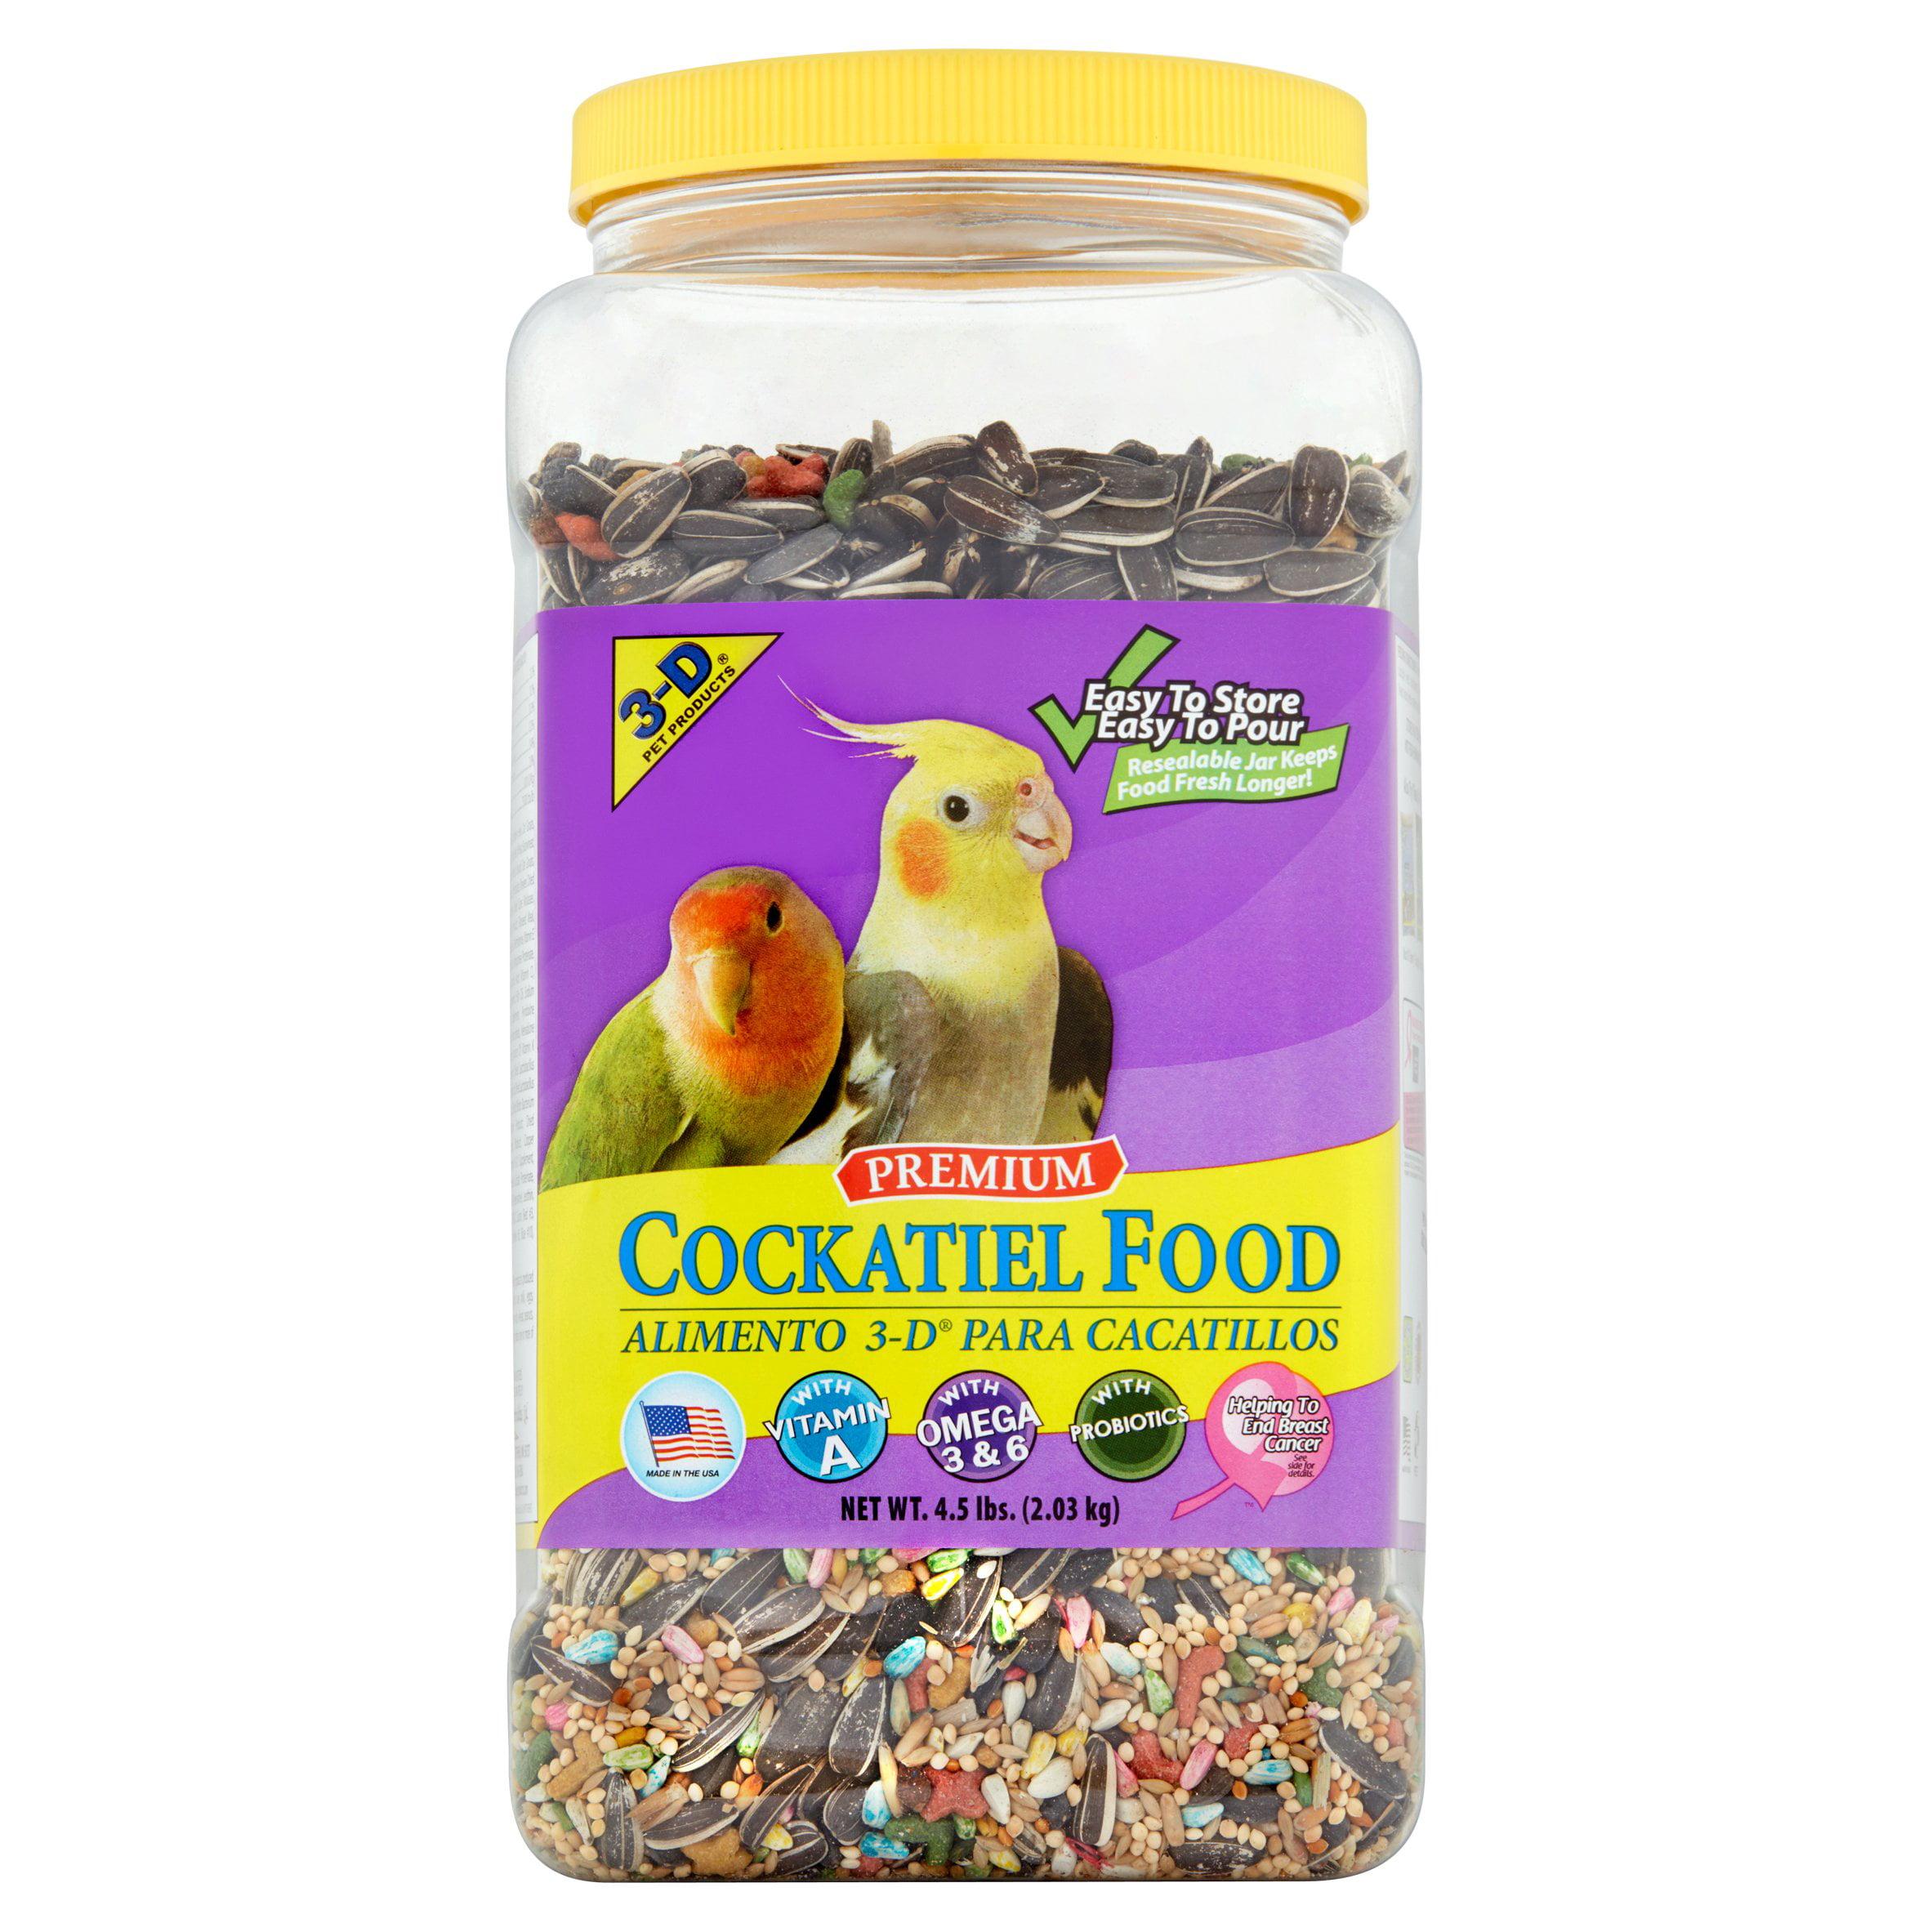 3-D Pet Products Premium Cockatiel Food, 4.5 lbs by D & D Commodities Ltd.